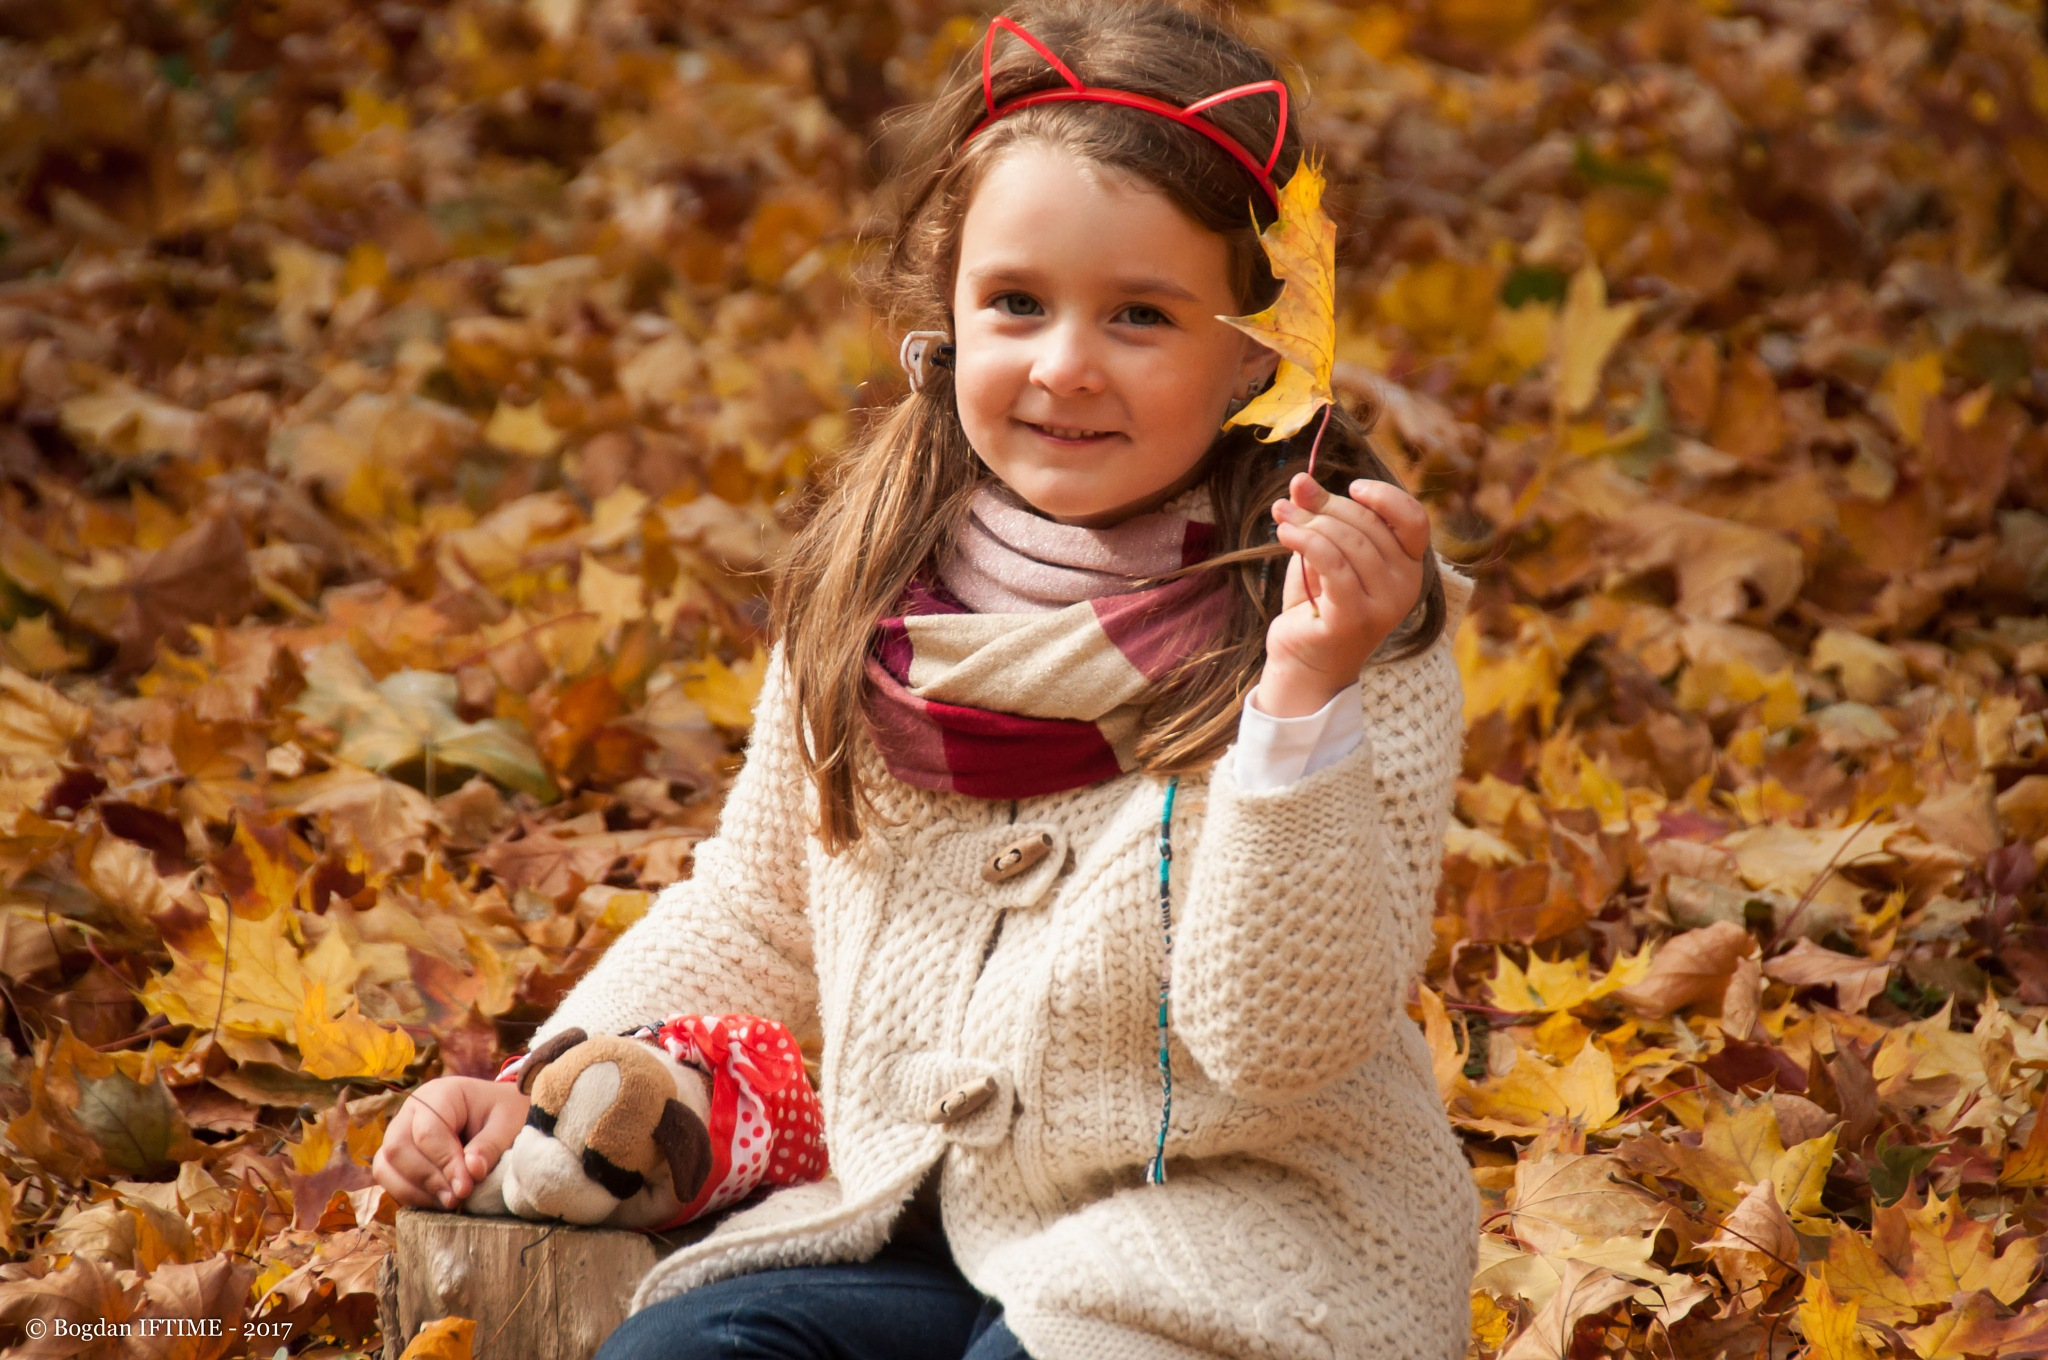 My beloved daughter by Bogdan Iftime